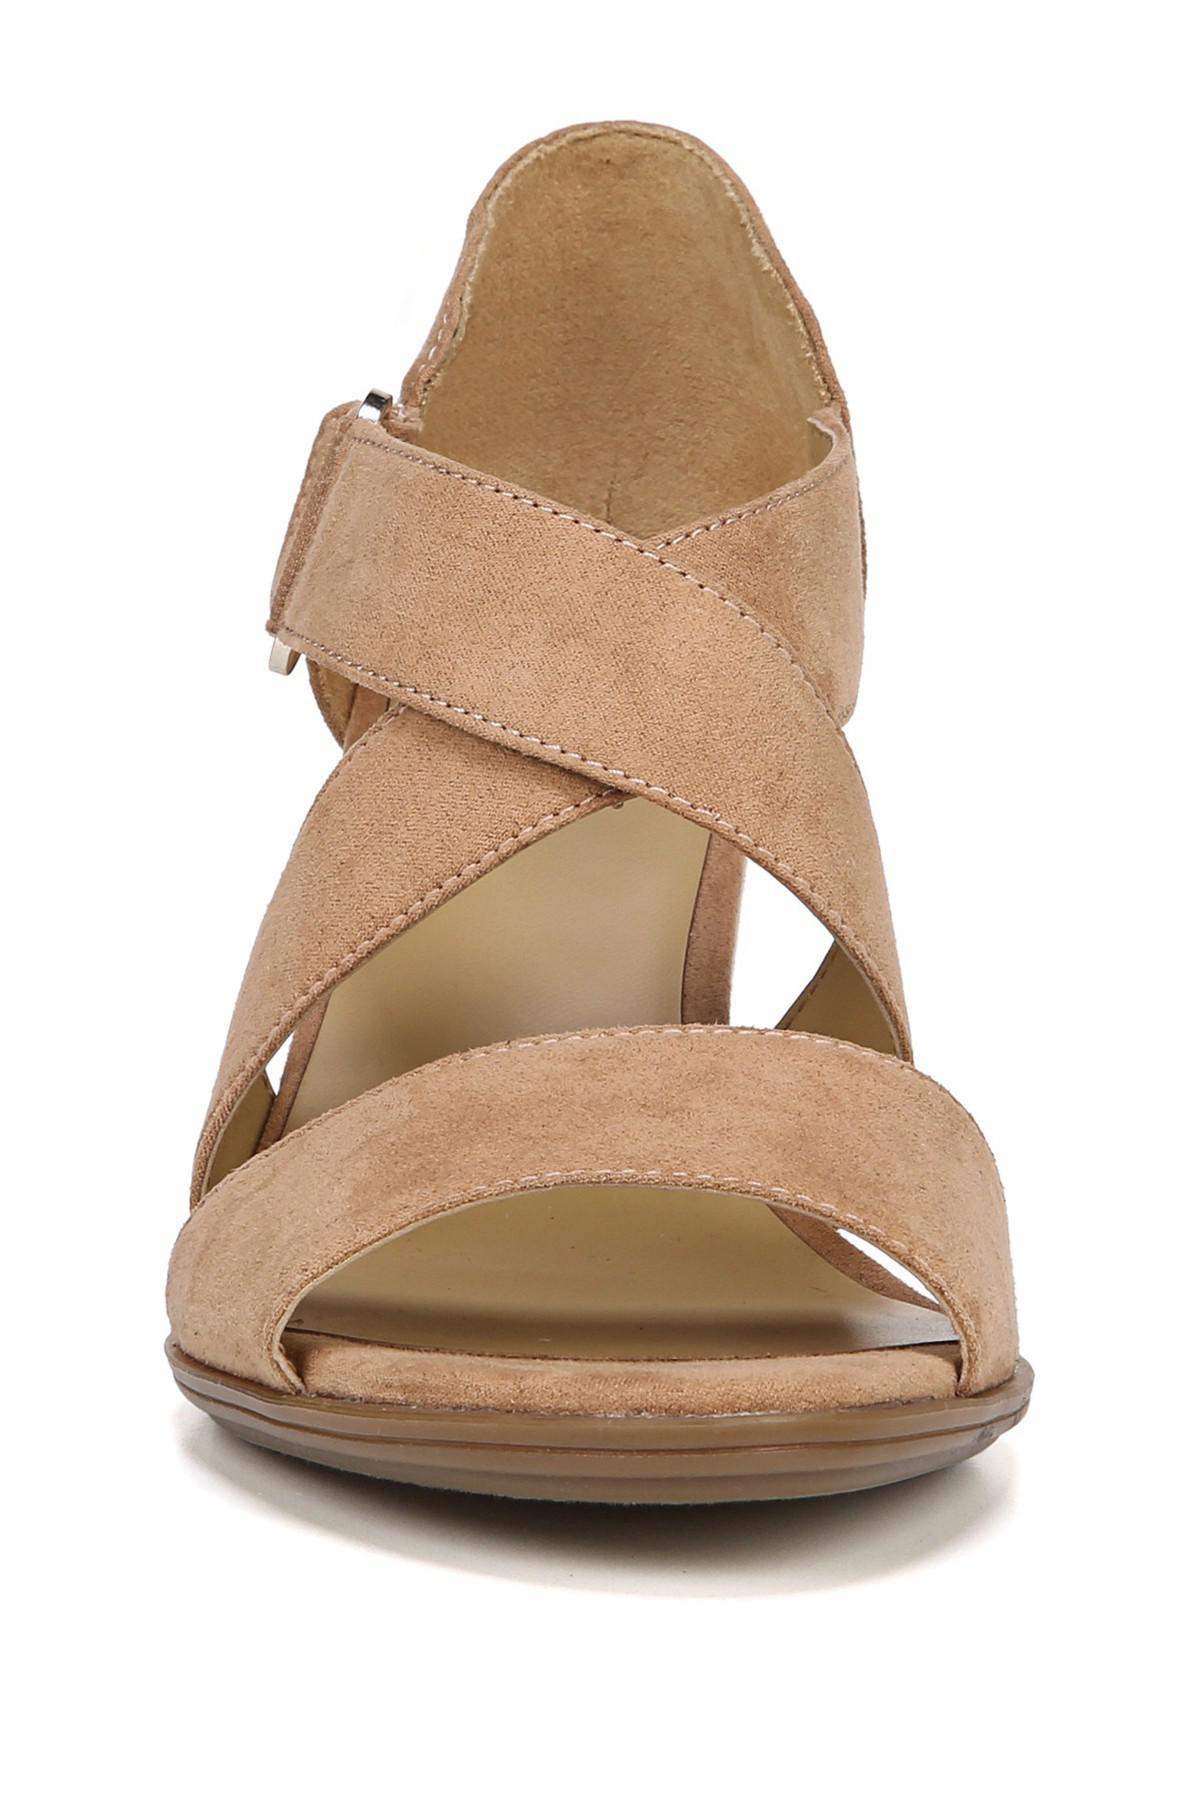 Naturalizer Lindy Sandal - Wide Width